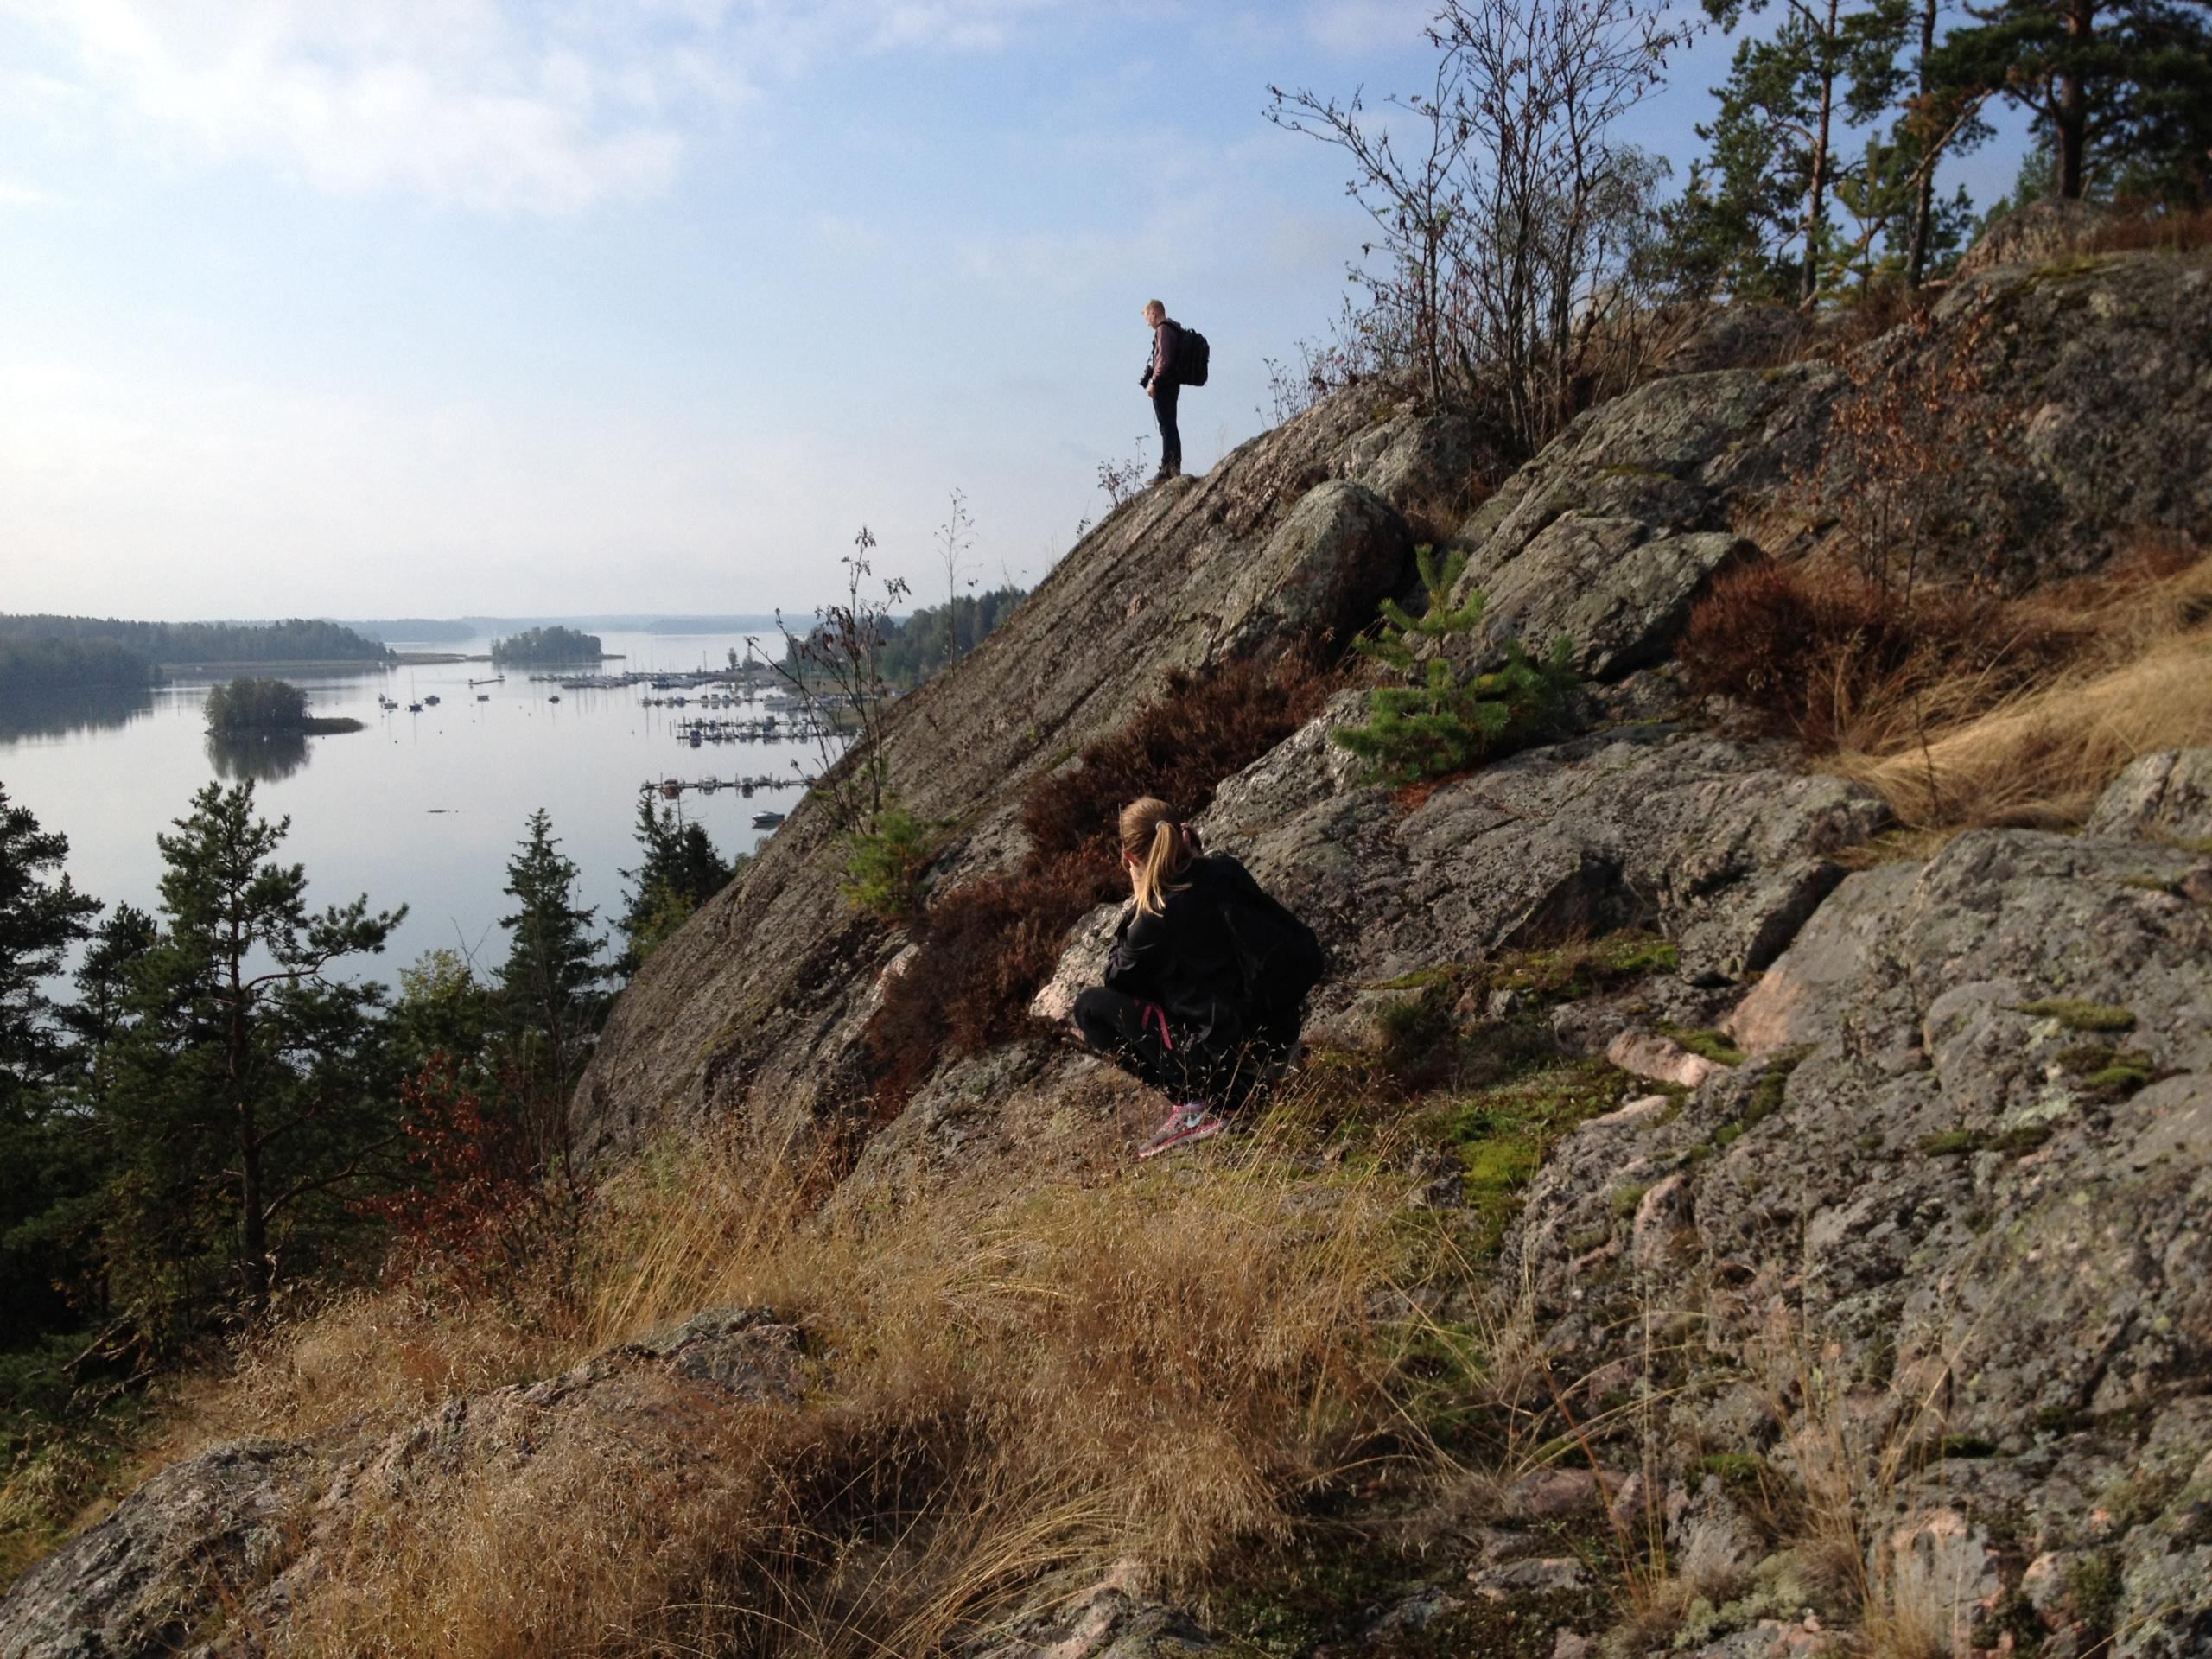 https://kansallisetkaupunkipuistot.fi/wp-content/uploads/2020/06/Porvoon_kalliot-scaled.jpg